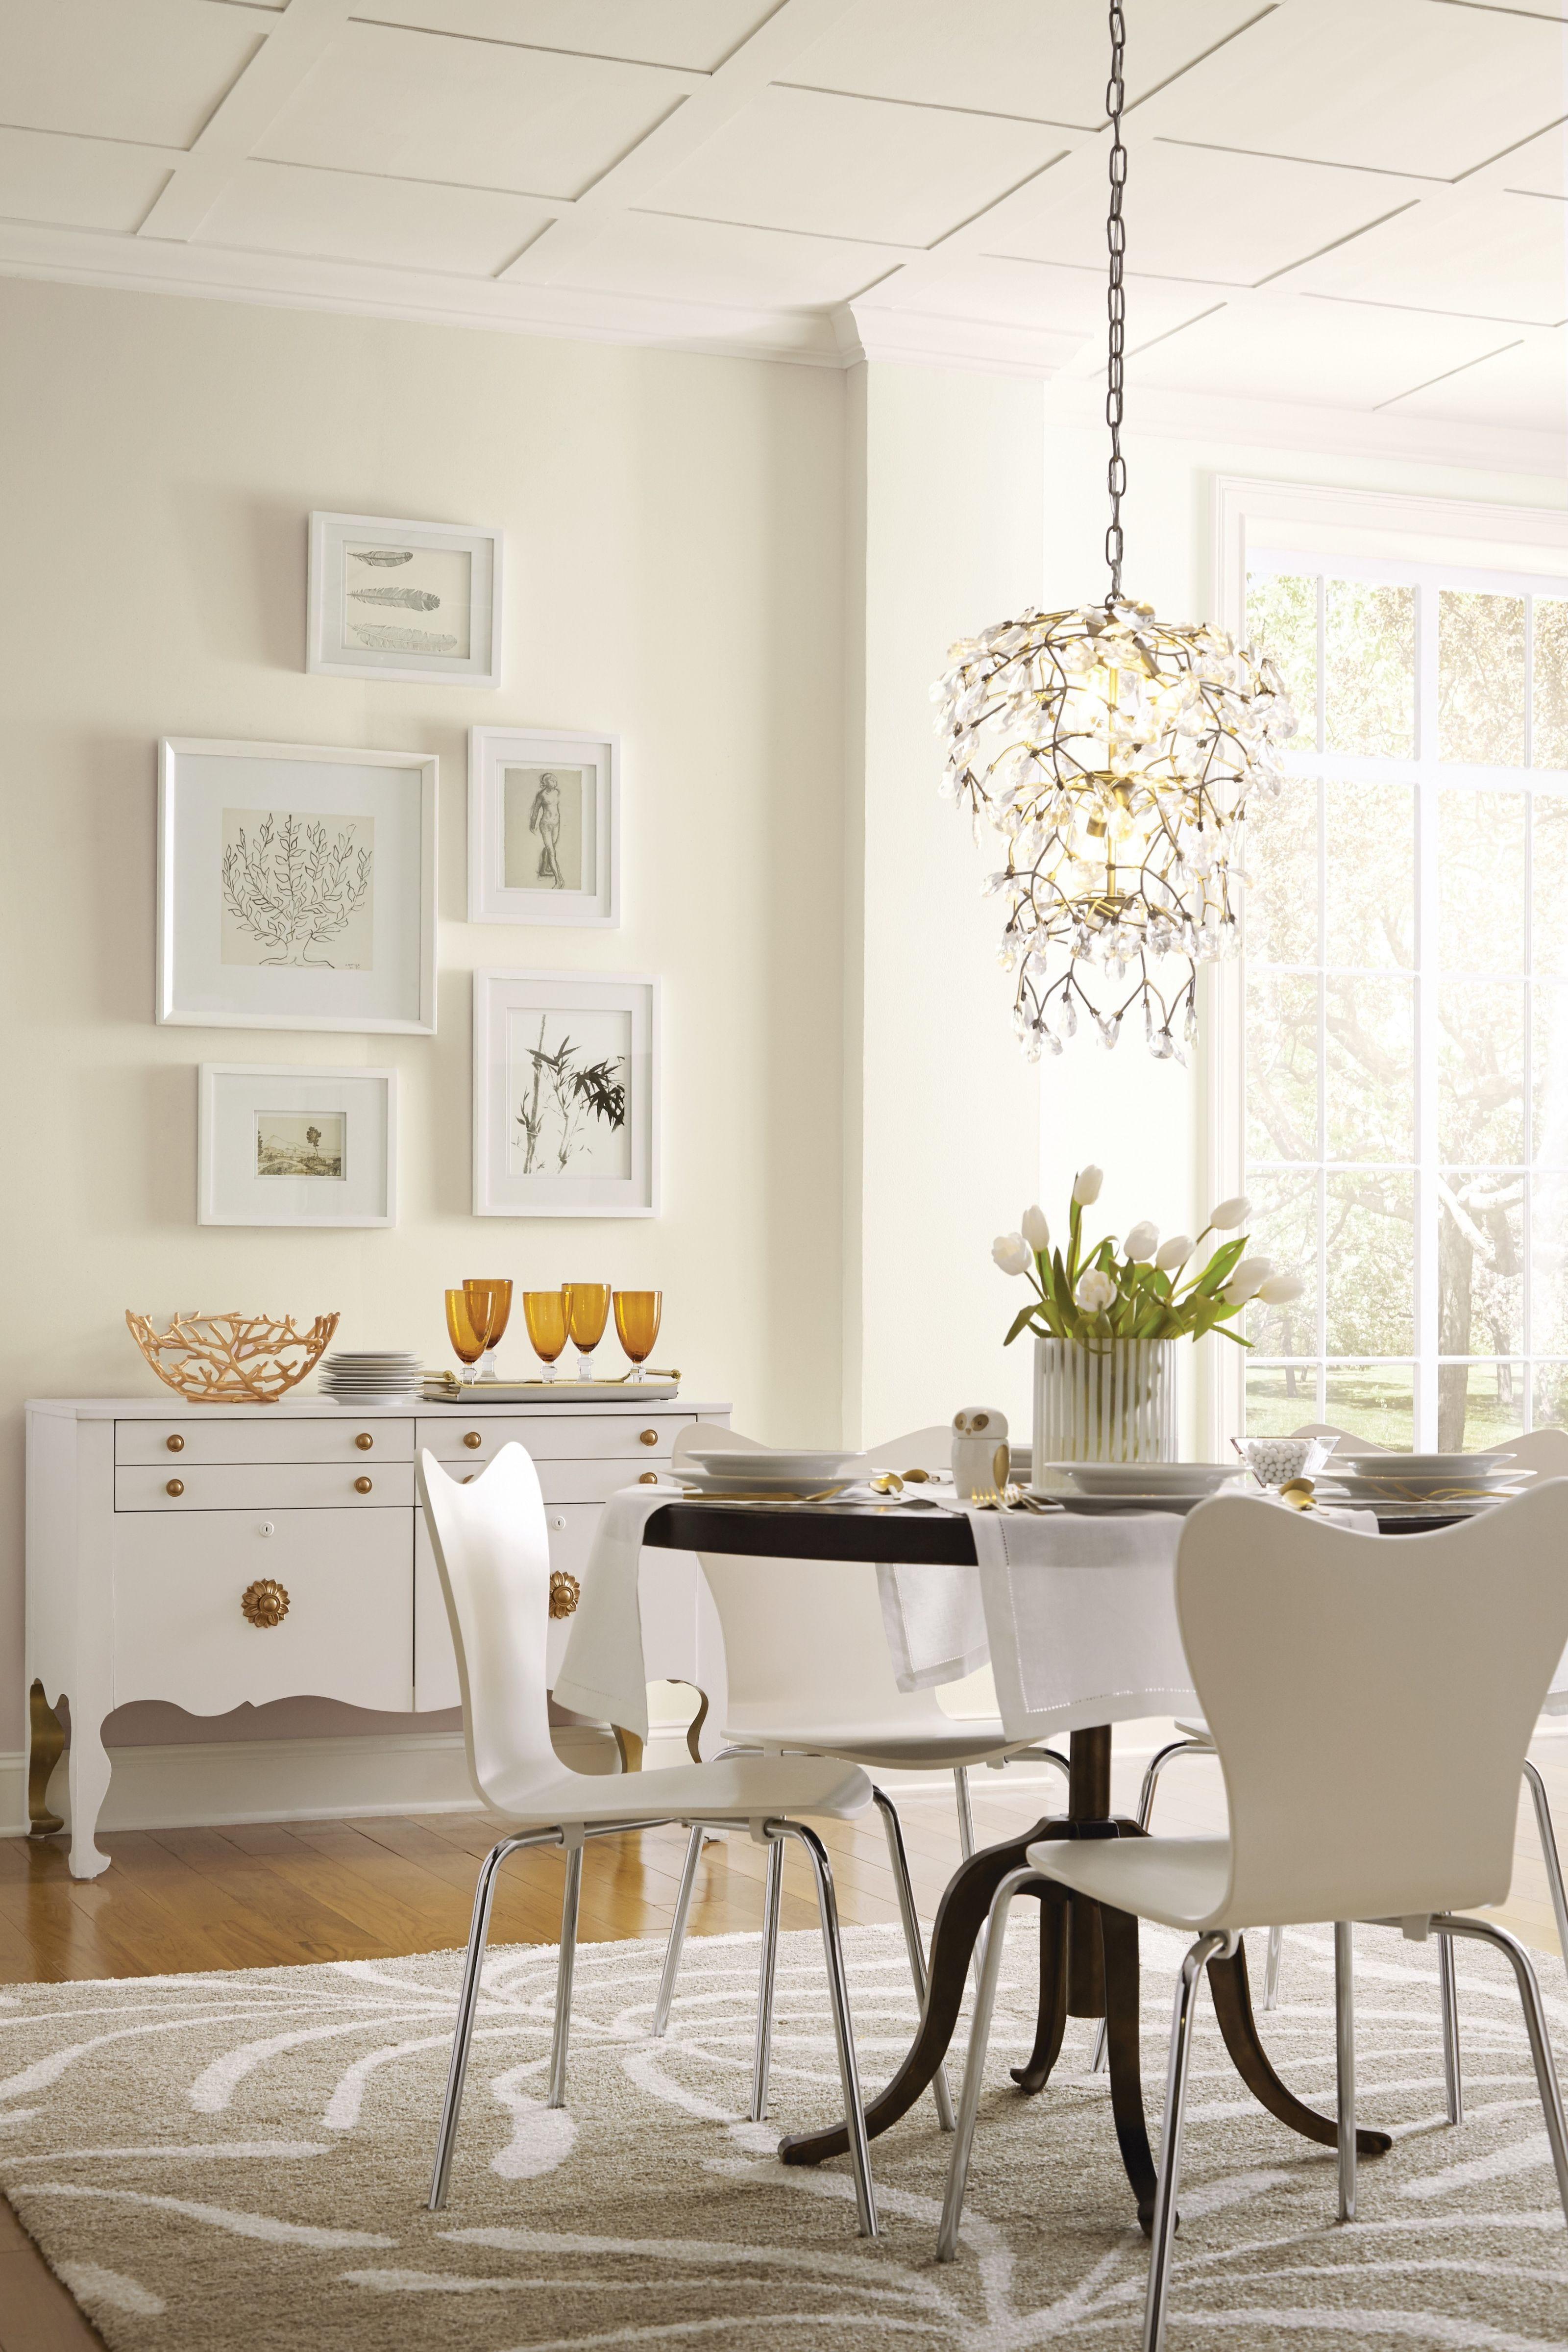 Interior design, Room, Floor, Flooring, Furniture, White, Wall, Table, Chair, Interior design,